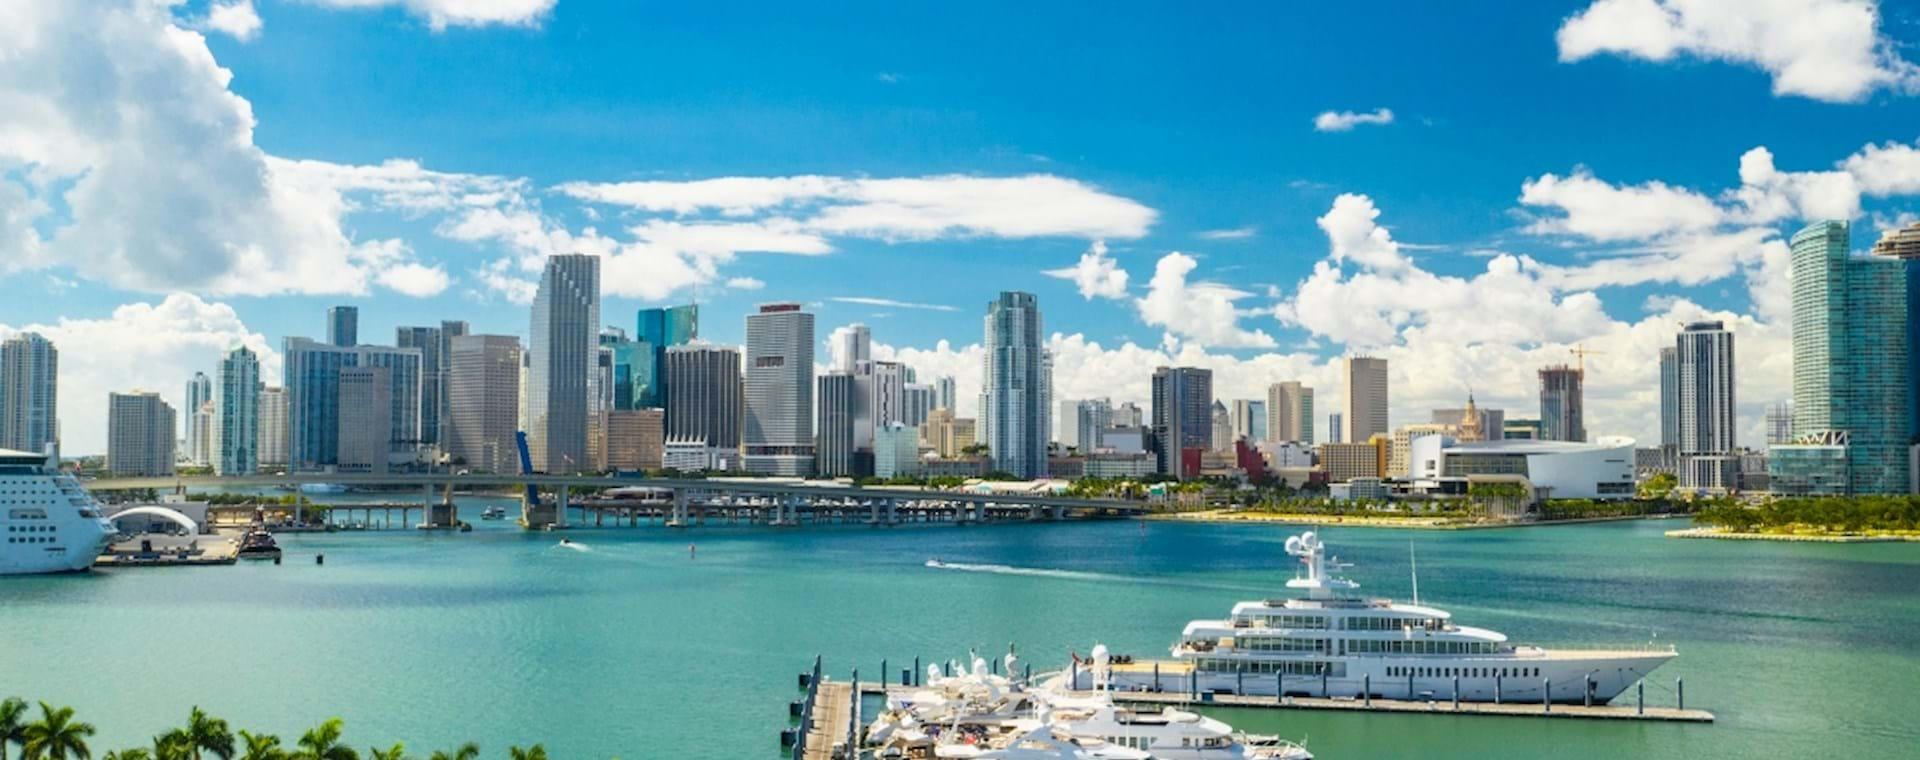 Miami Downtown and Island Garden Marina